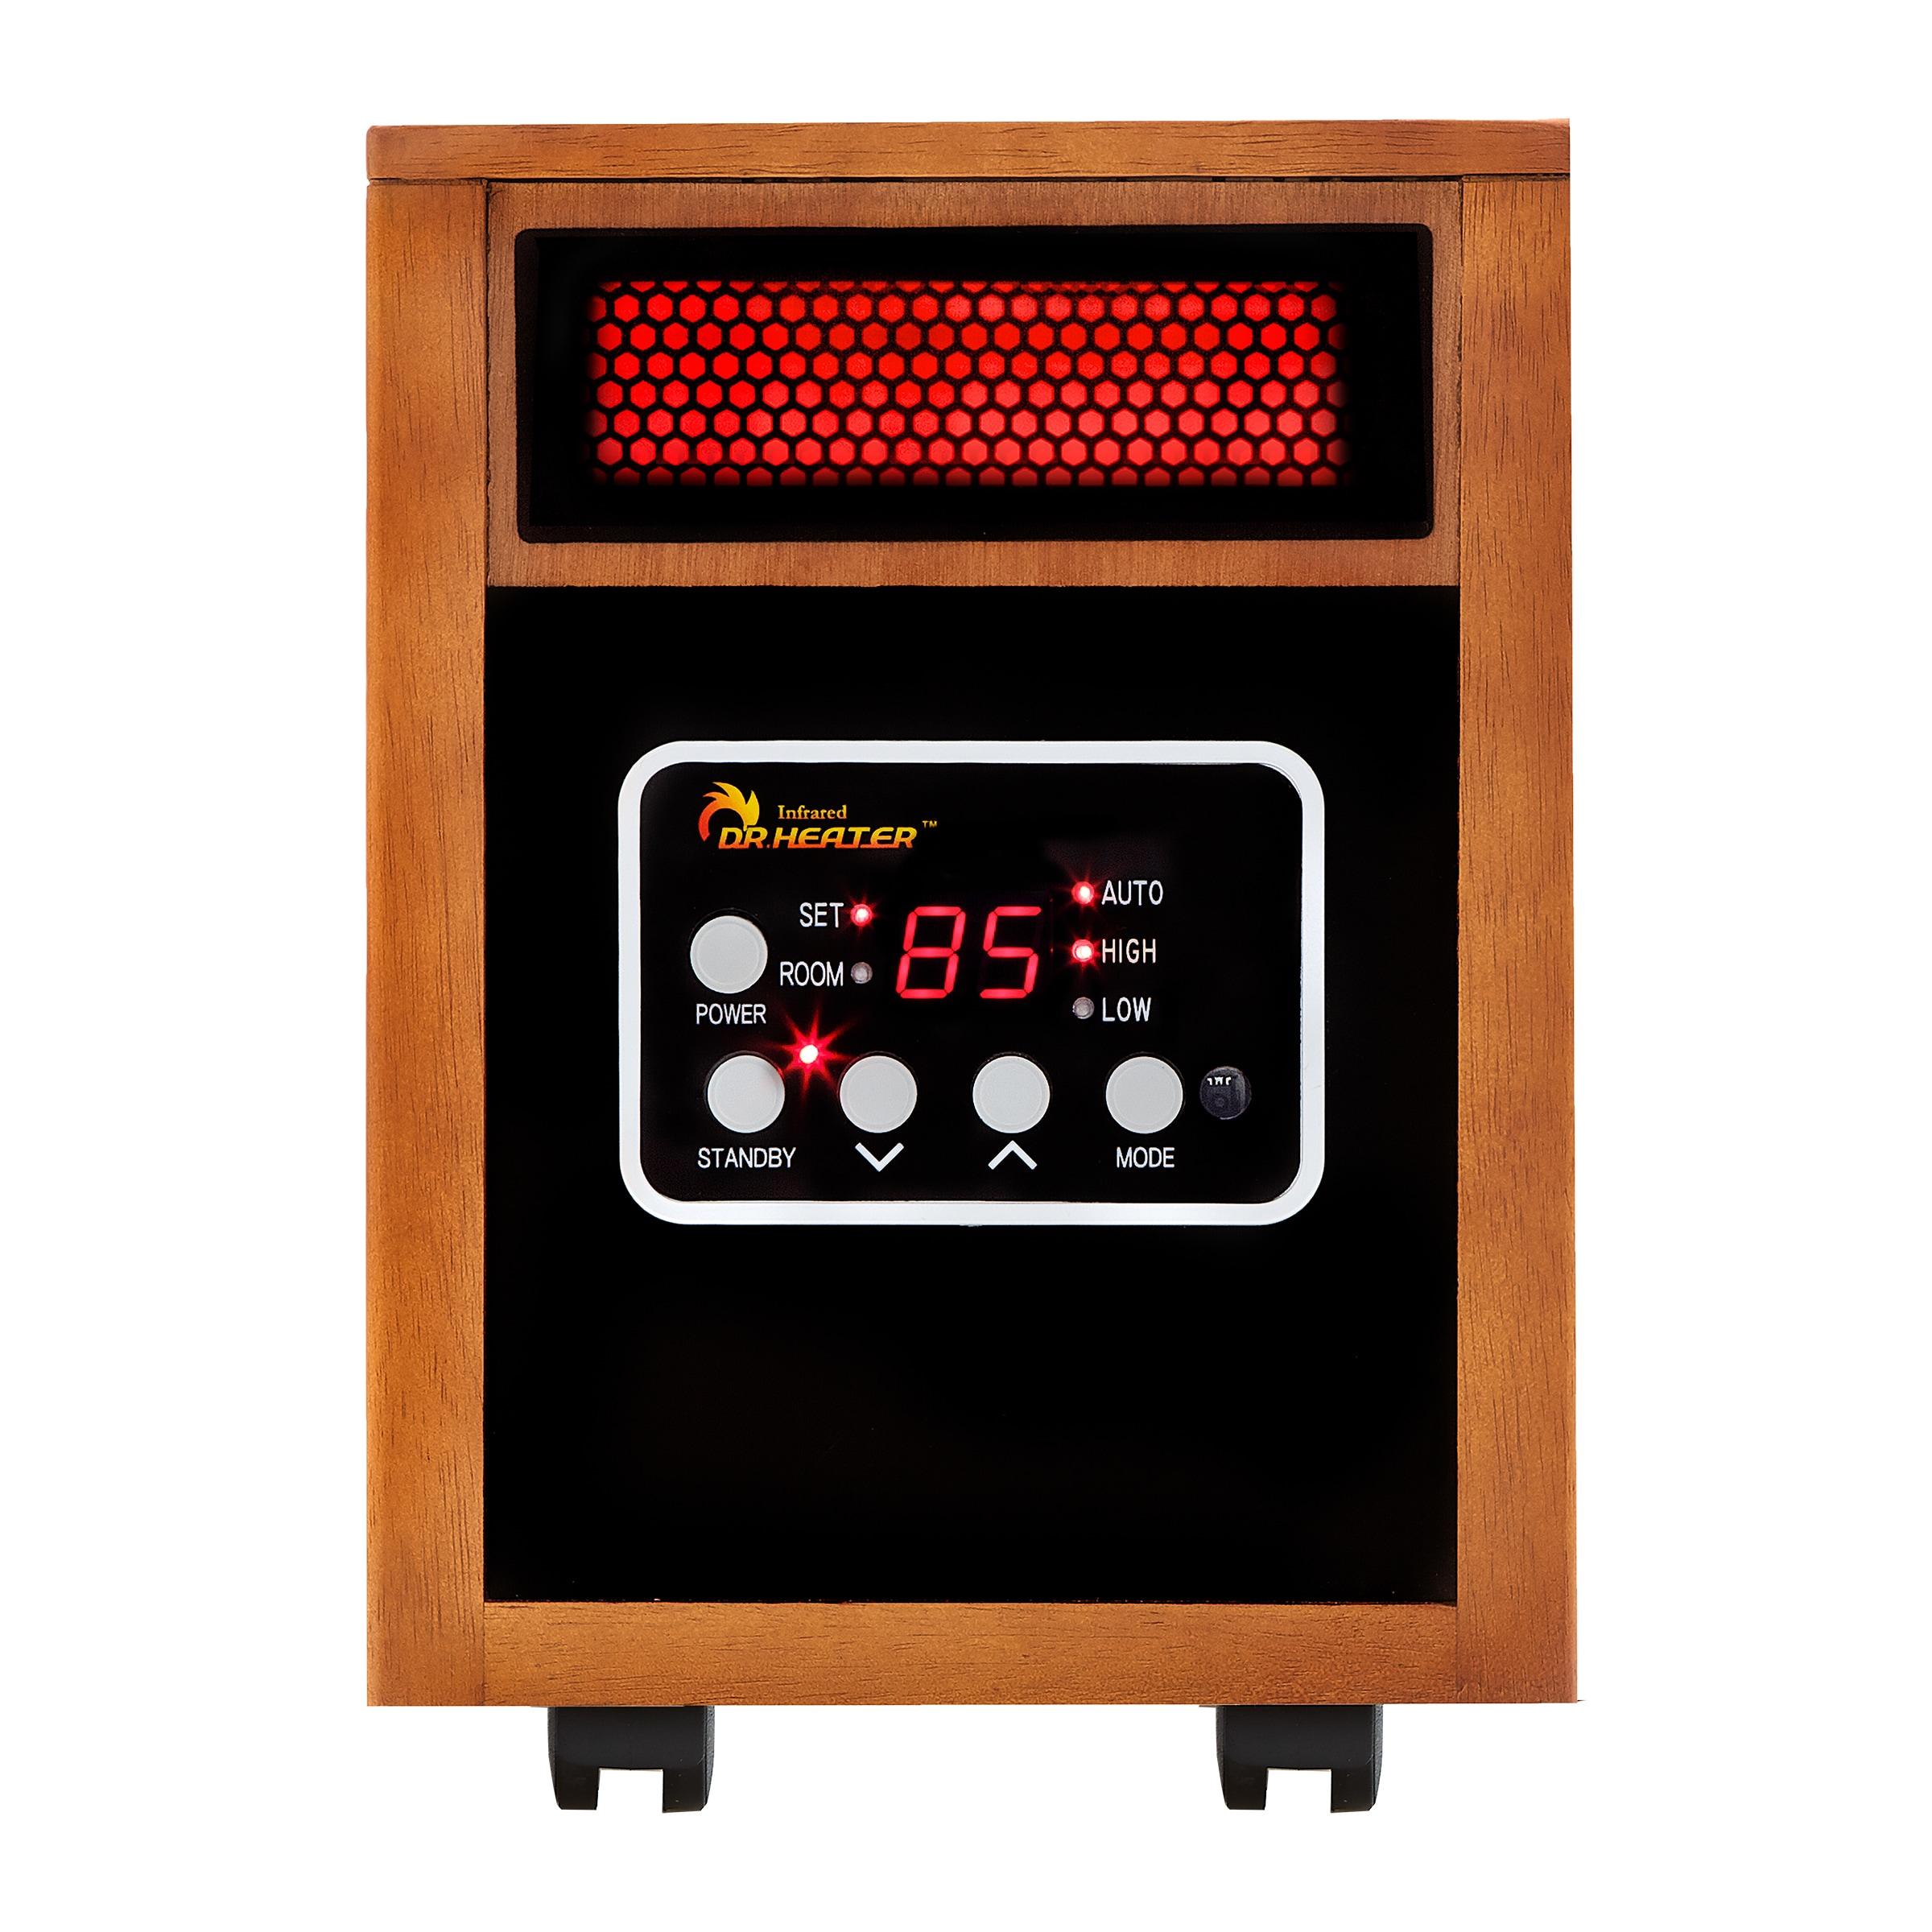 USA Dr. Infrared Heater DR-968 1500-watt Portable Space H...